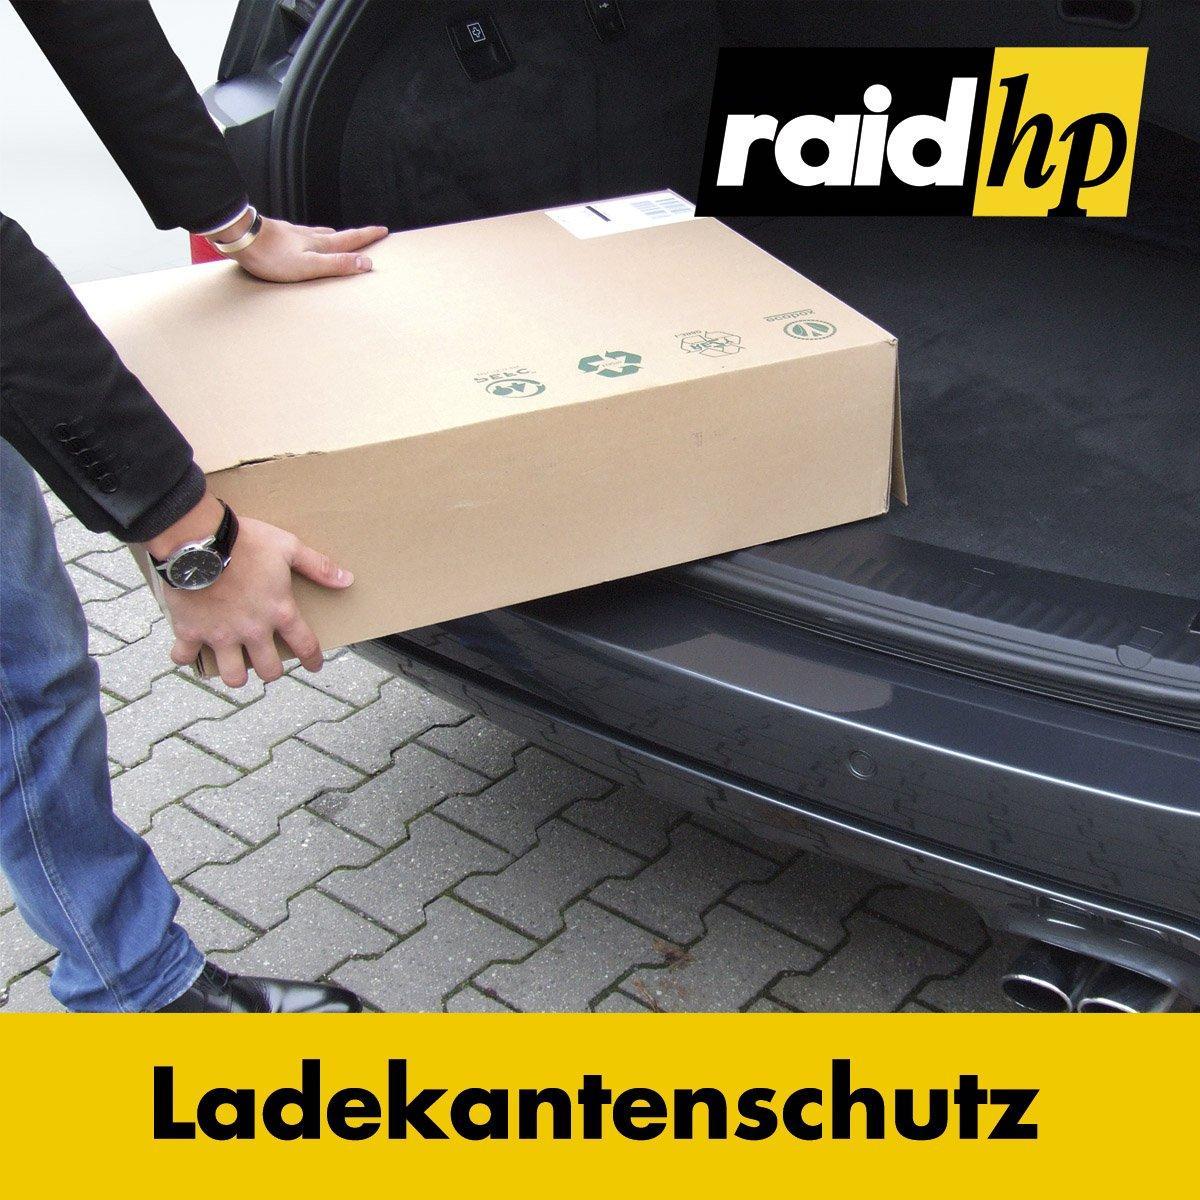 3+5 T/Ã/¼rer raid hp Ladekantenschutz-Folie  Yaris Typ XP13 ab 2010-